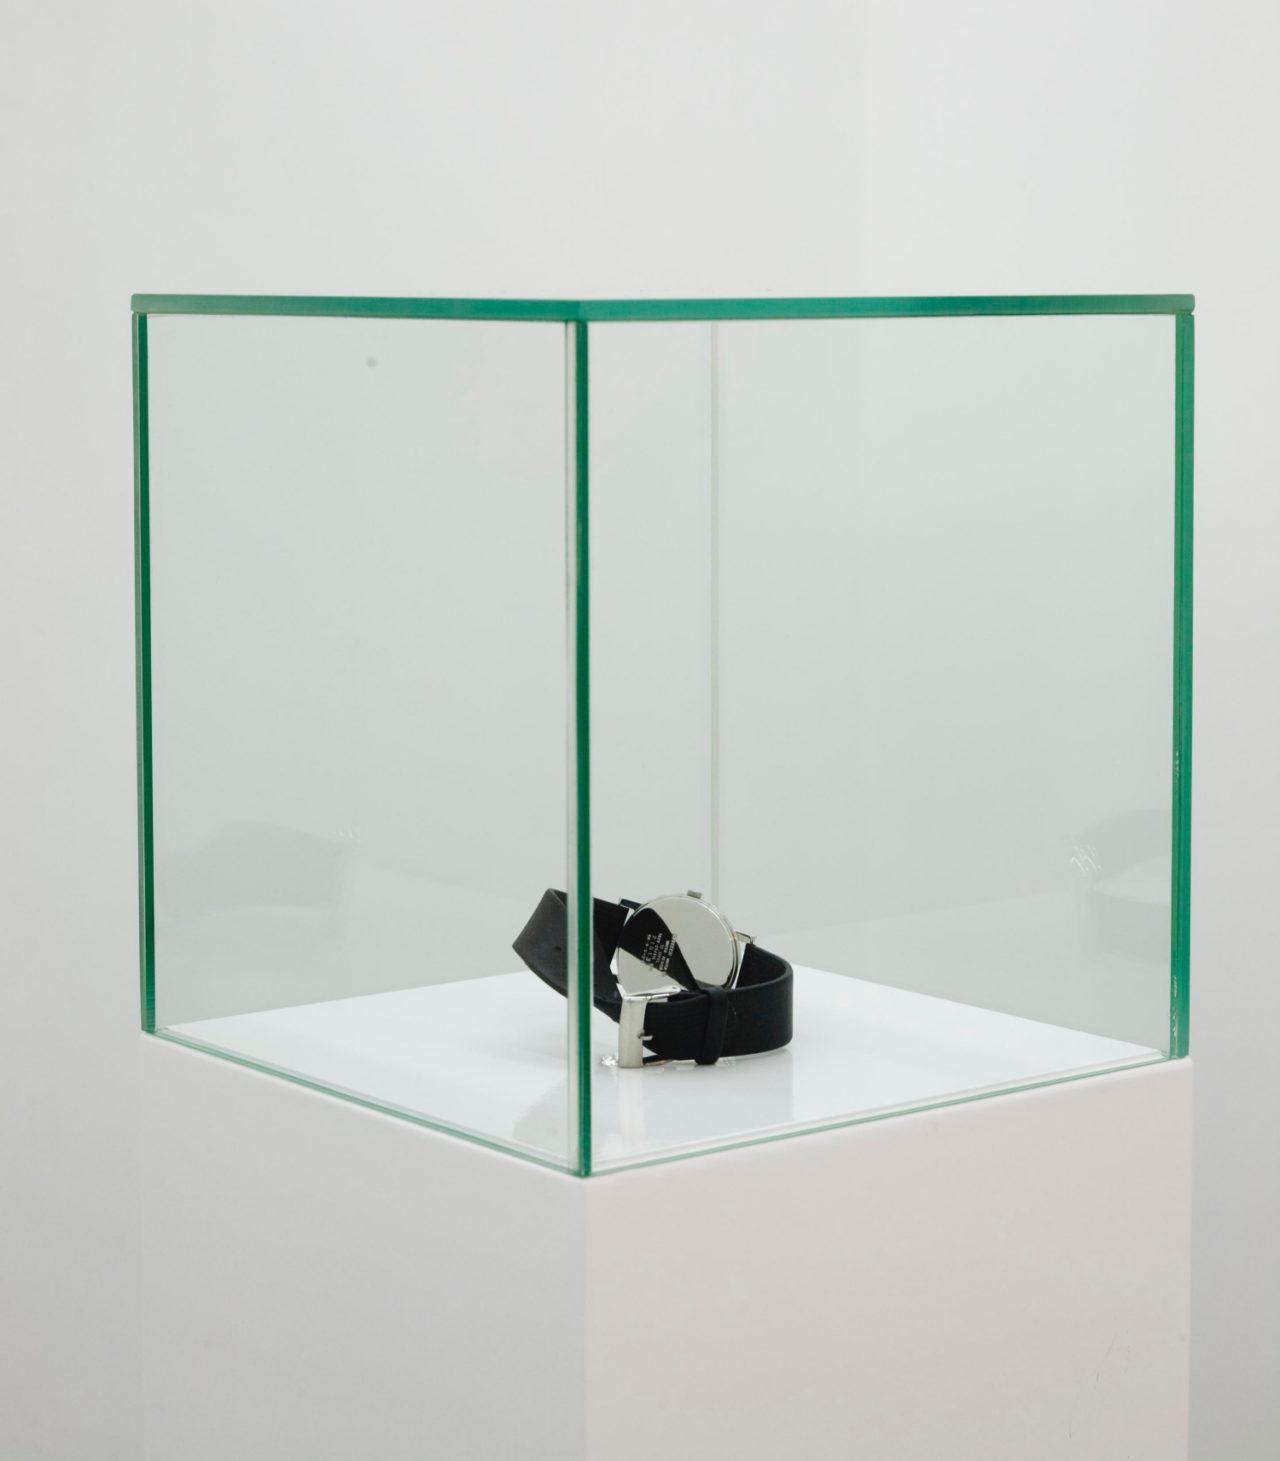 Jan Timme, Le temps tordu (2002)